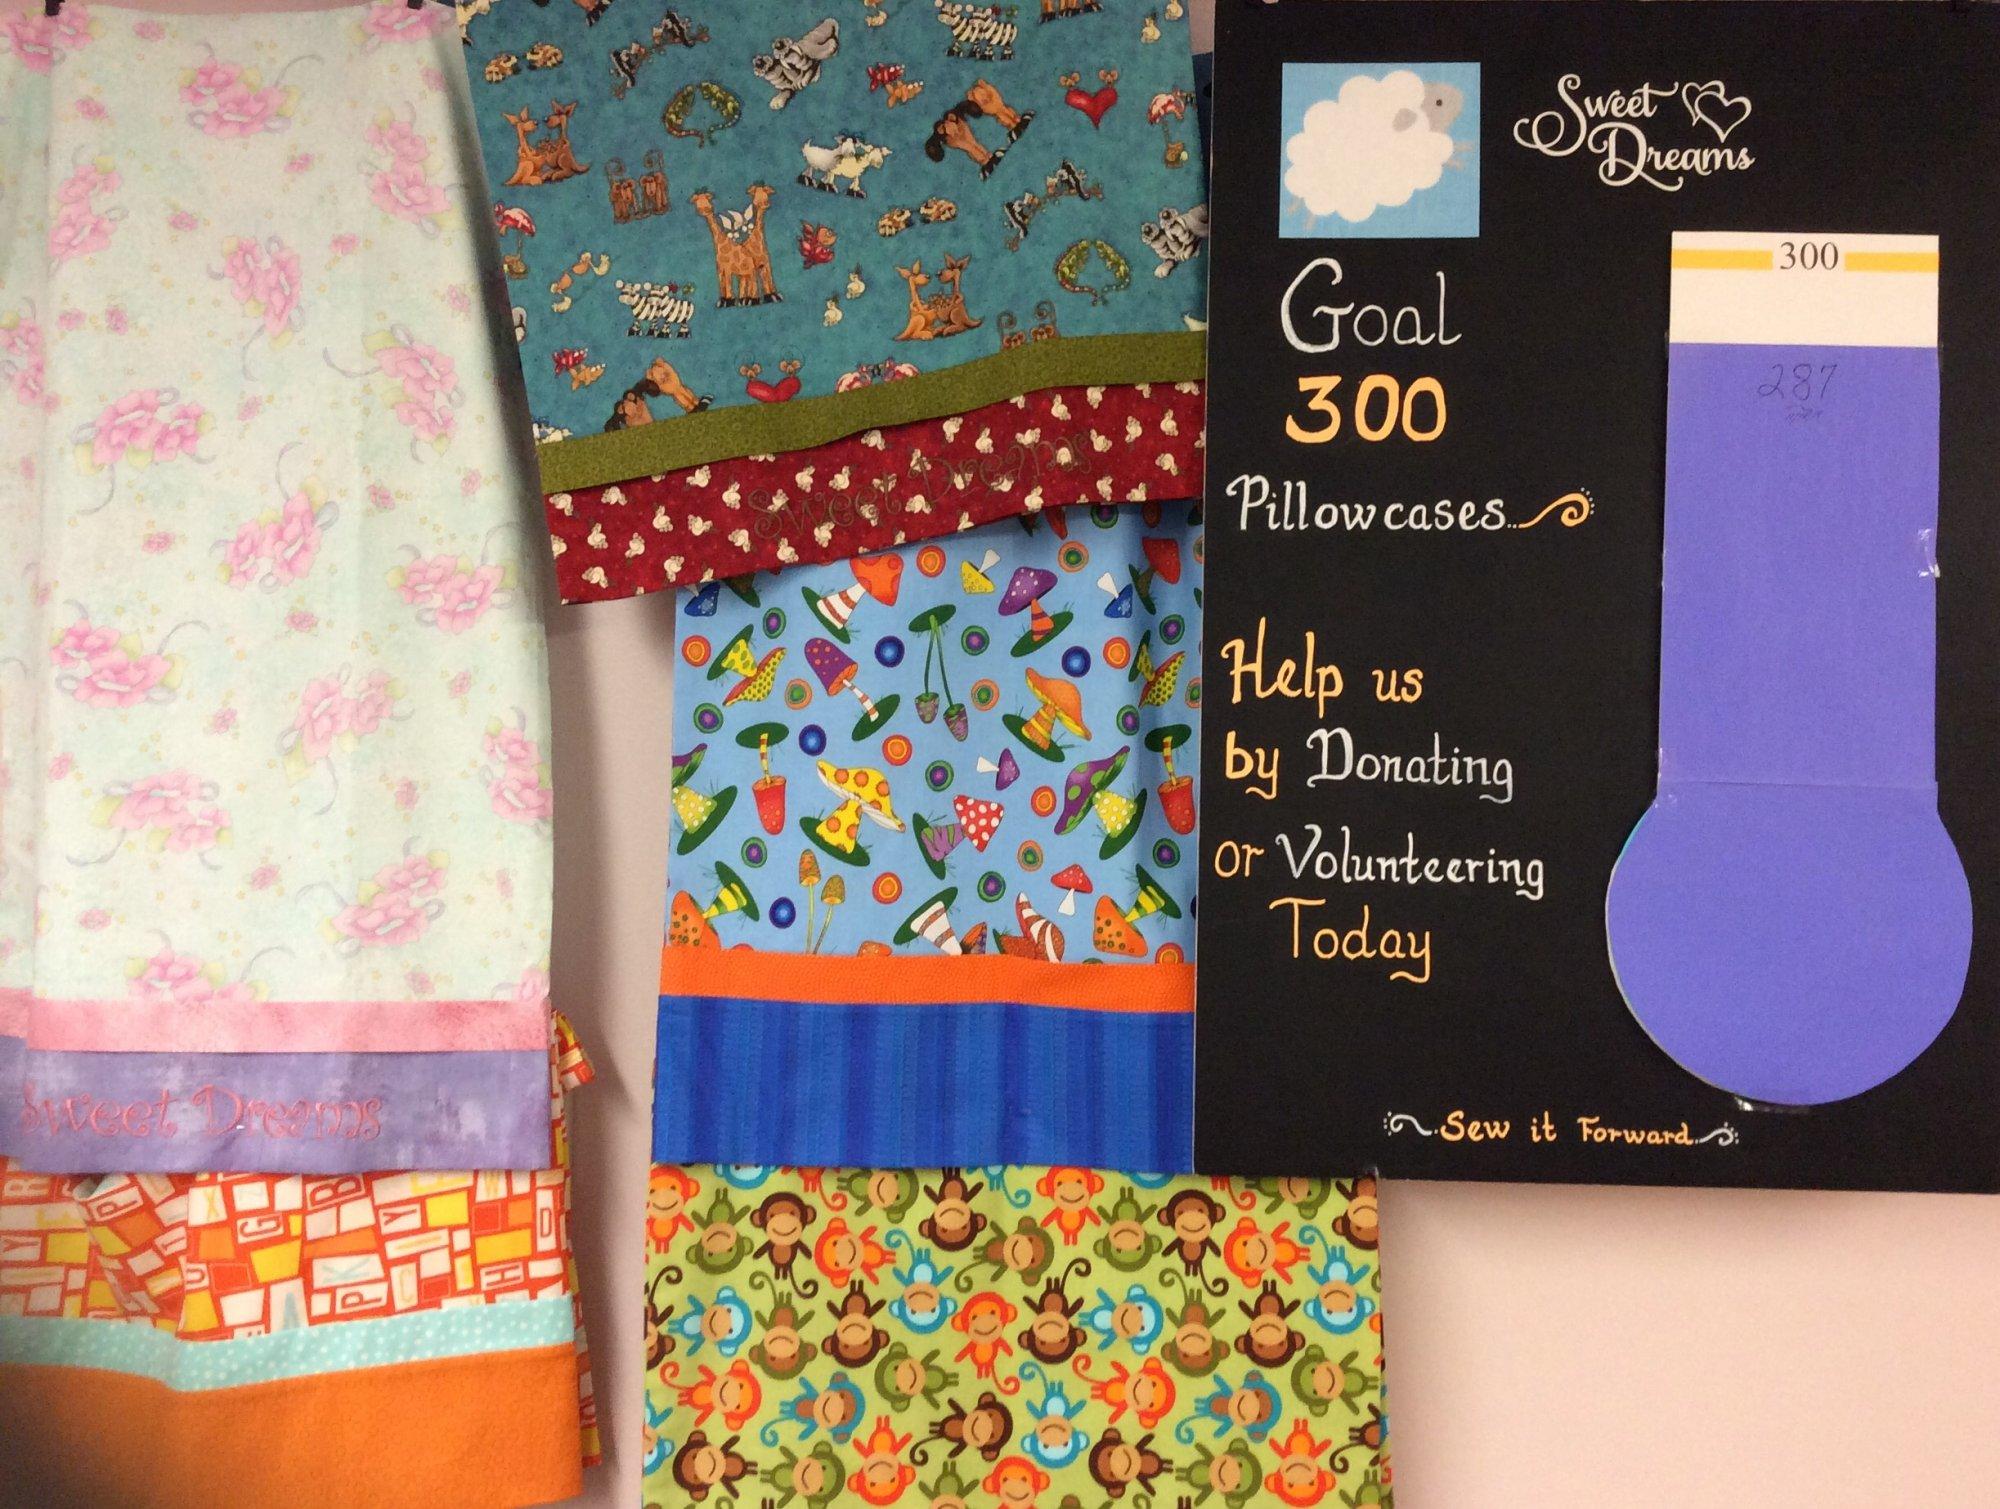 Sweet Dreams Charity Pillowcase Sew In